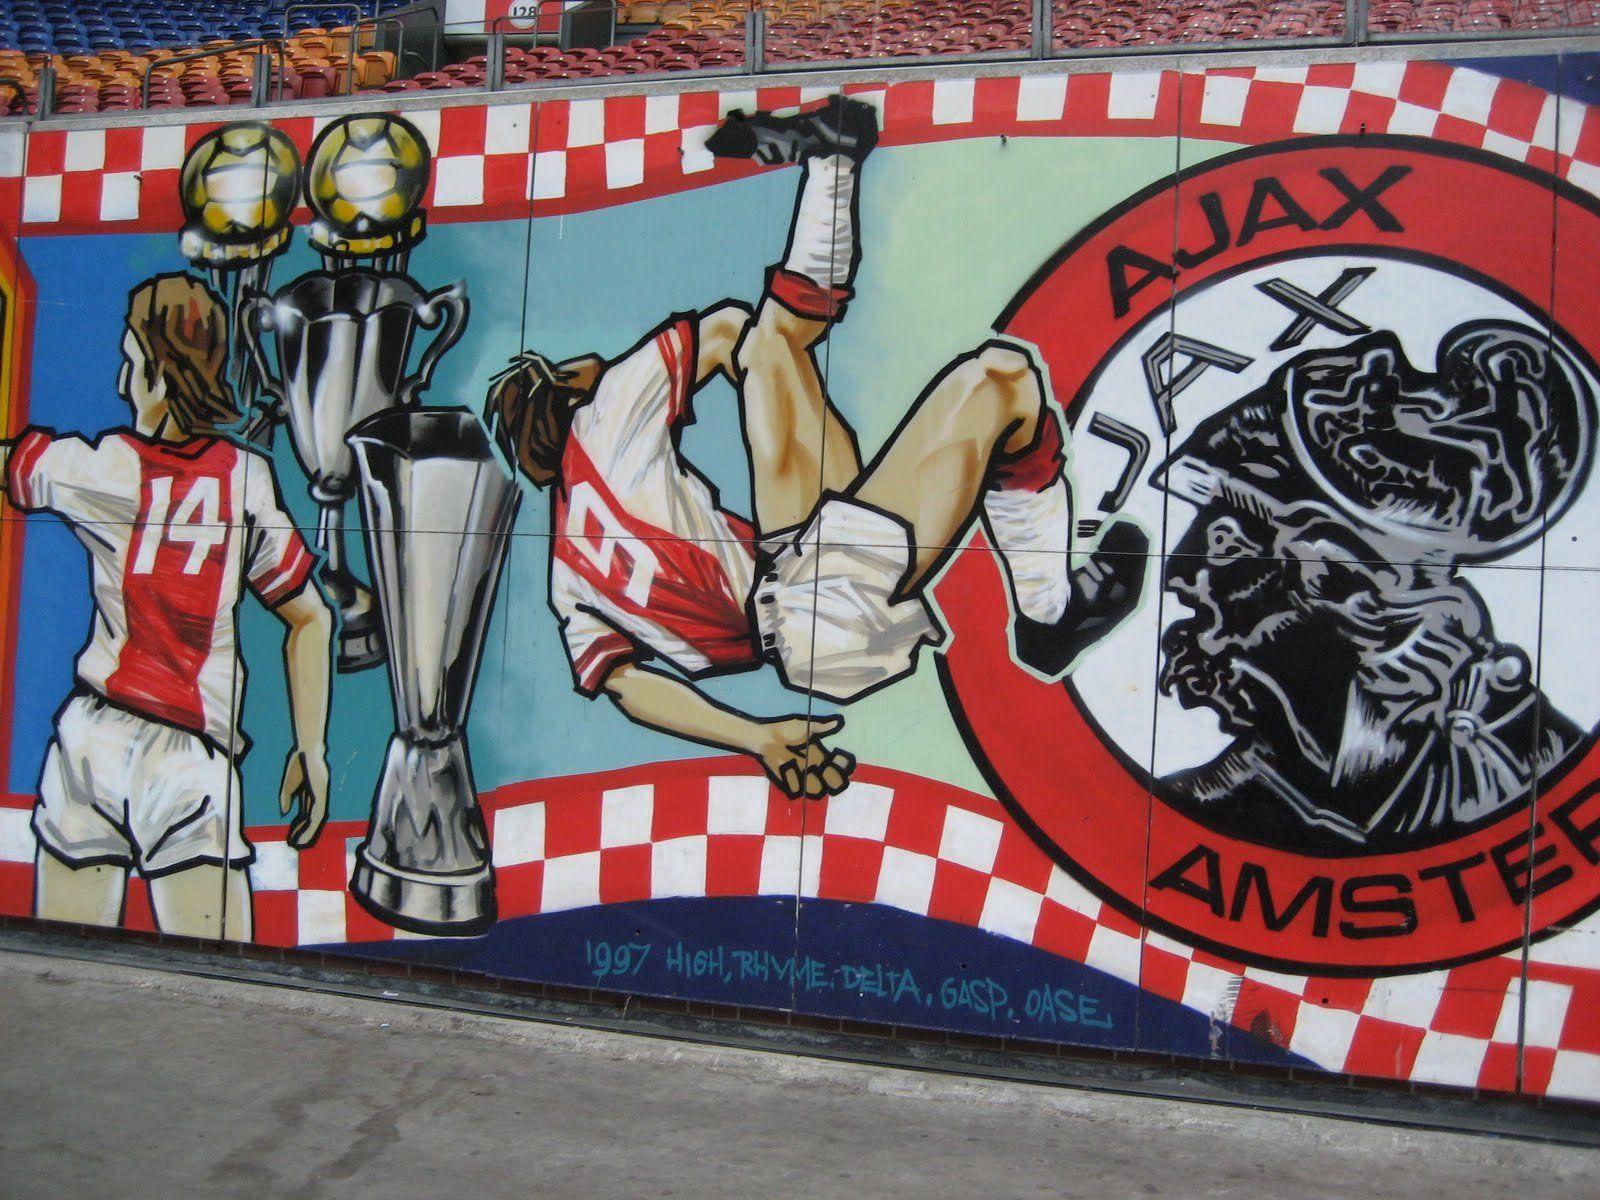 Graffiti wall amsterdam - Ajax Cruyff Afc Ajaxstreet Artlyonmanchester Unitedituwall Artamsterdam Finalsgraffiti